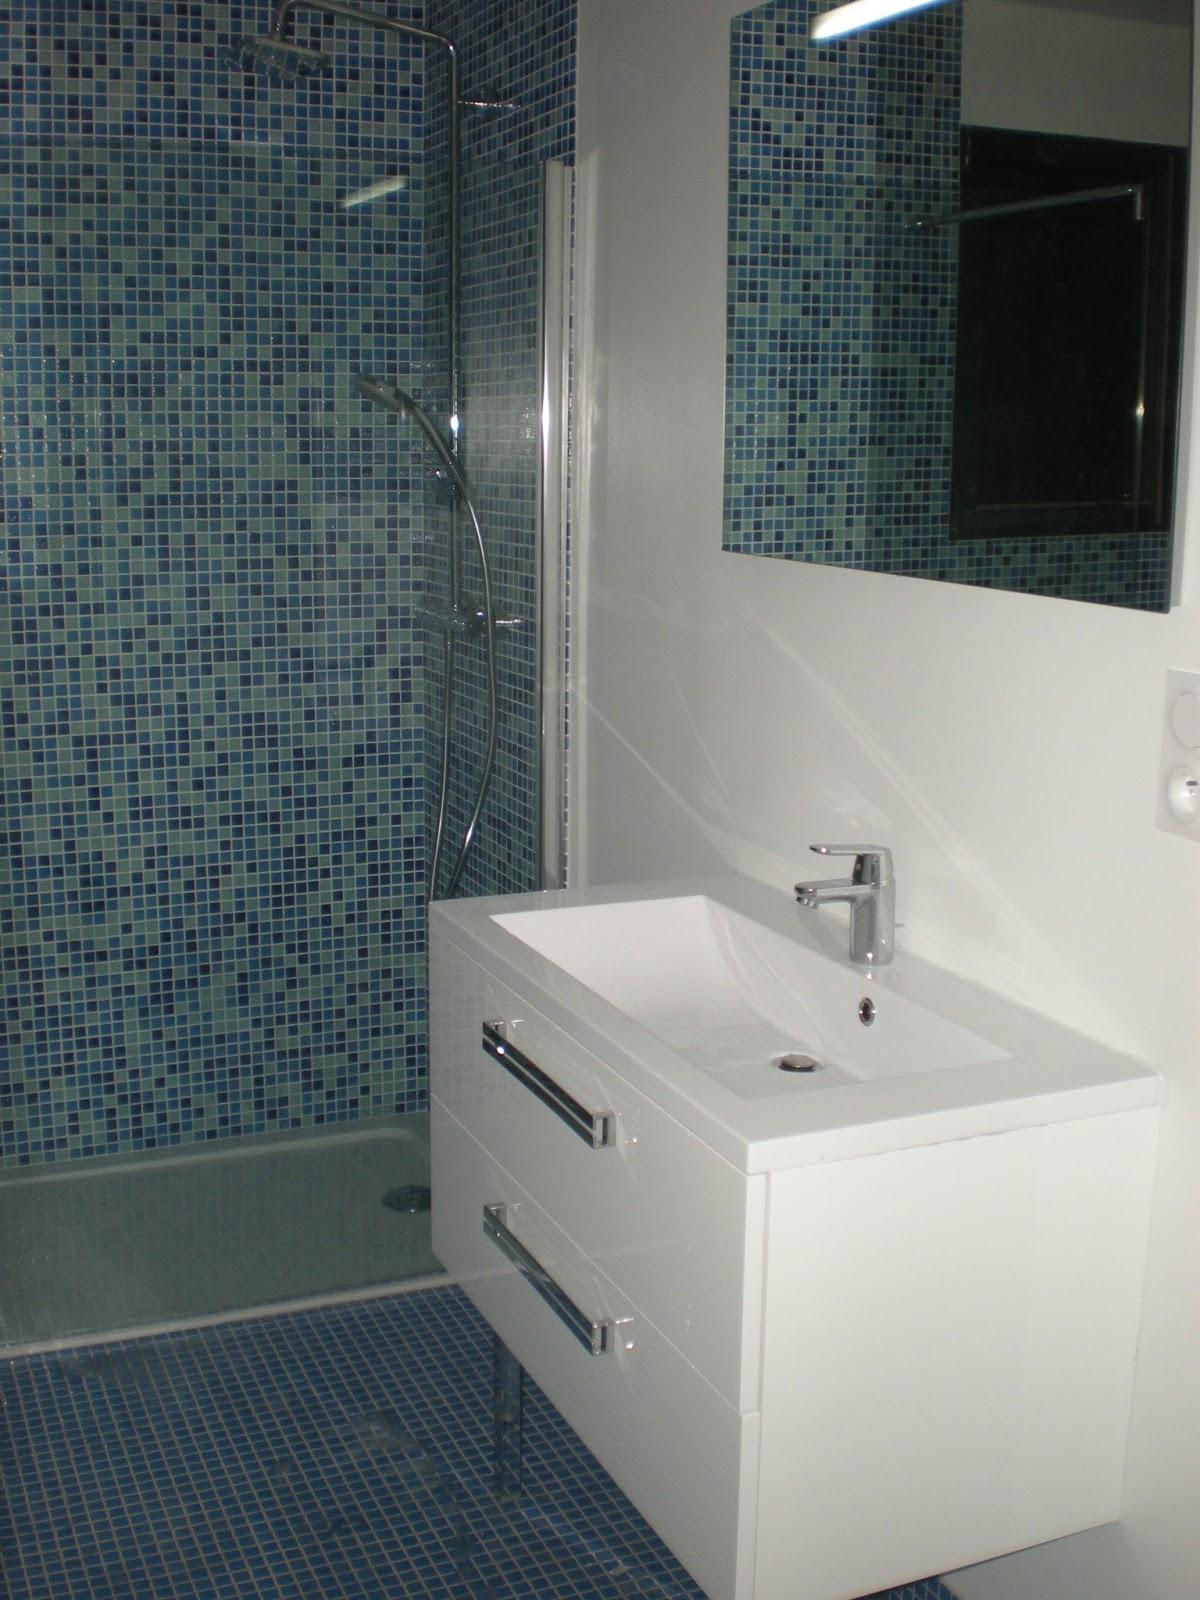 boyer harold plombier chauffagiste depannage rapide creation de salle de bain. Black Bedroom Furniture Sets. Home Design Ideas